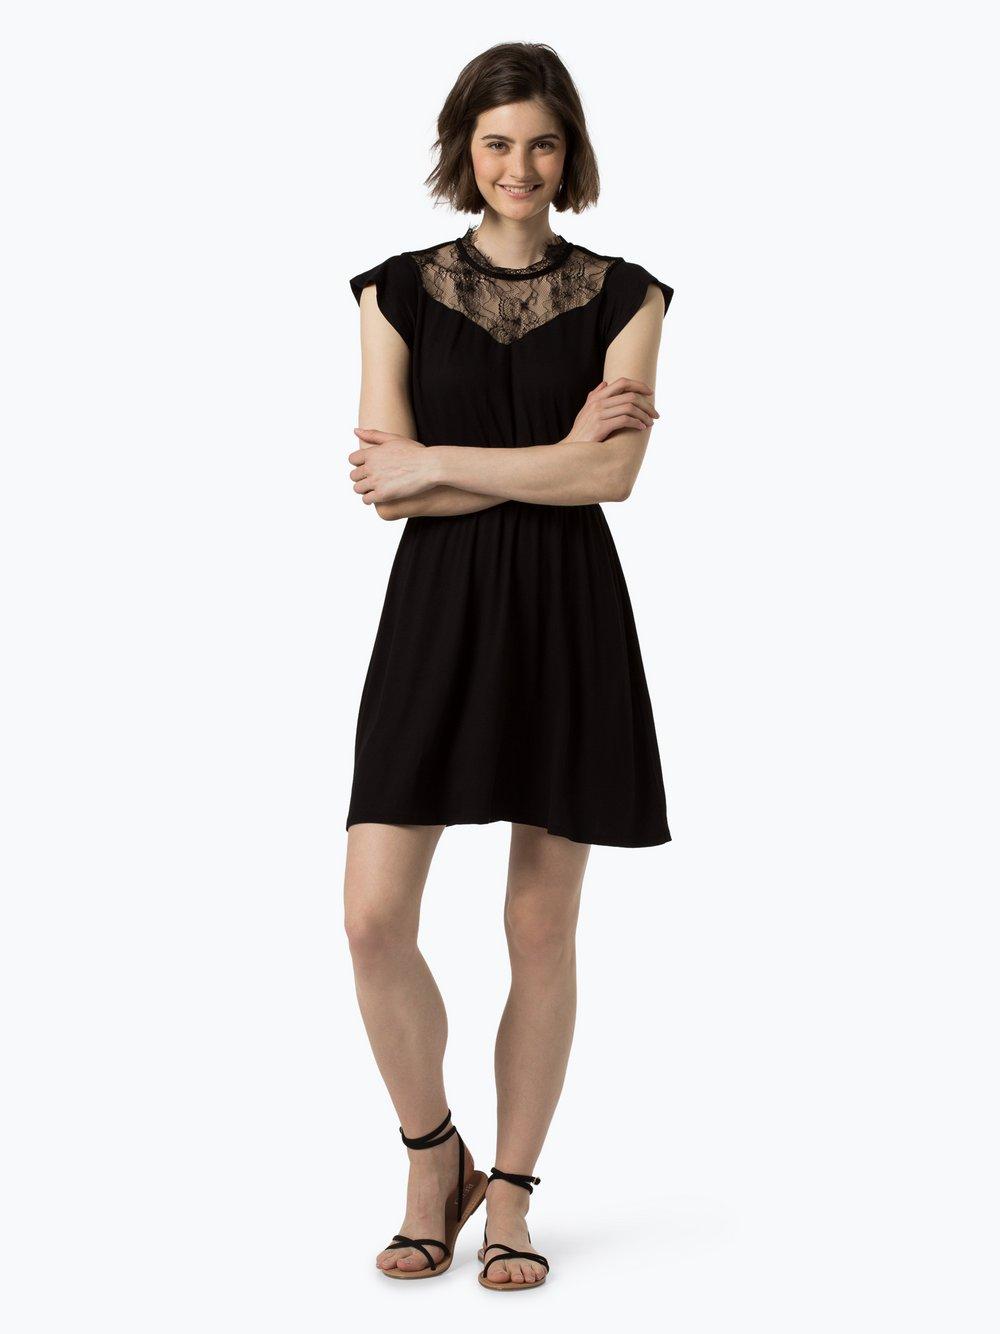 ONLY - Sukienka damska – Onlamila, czarny